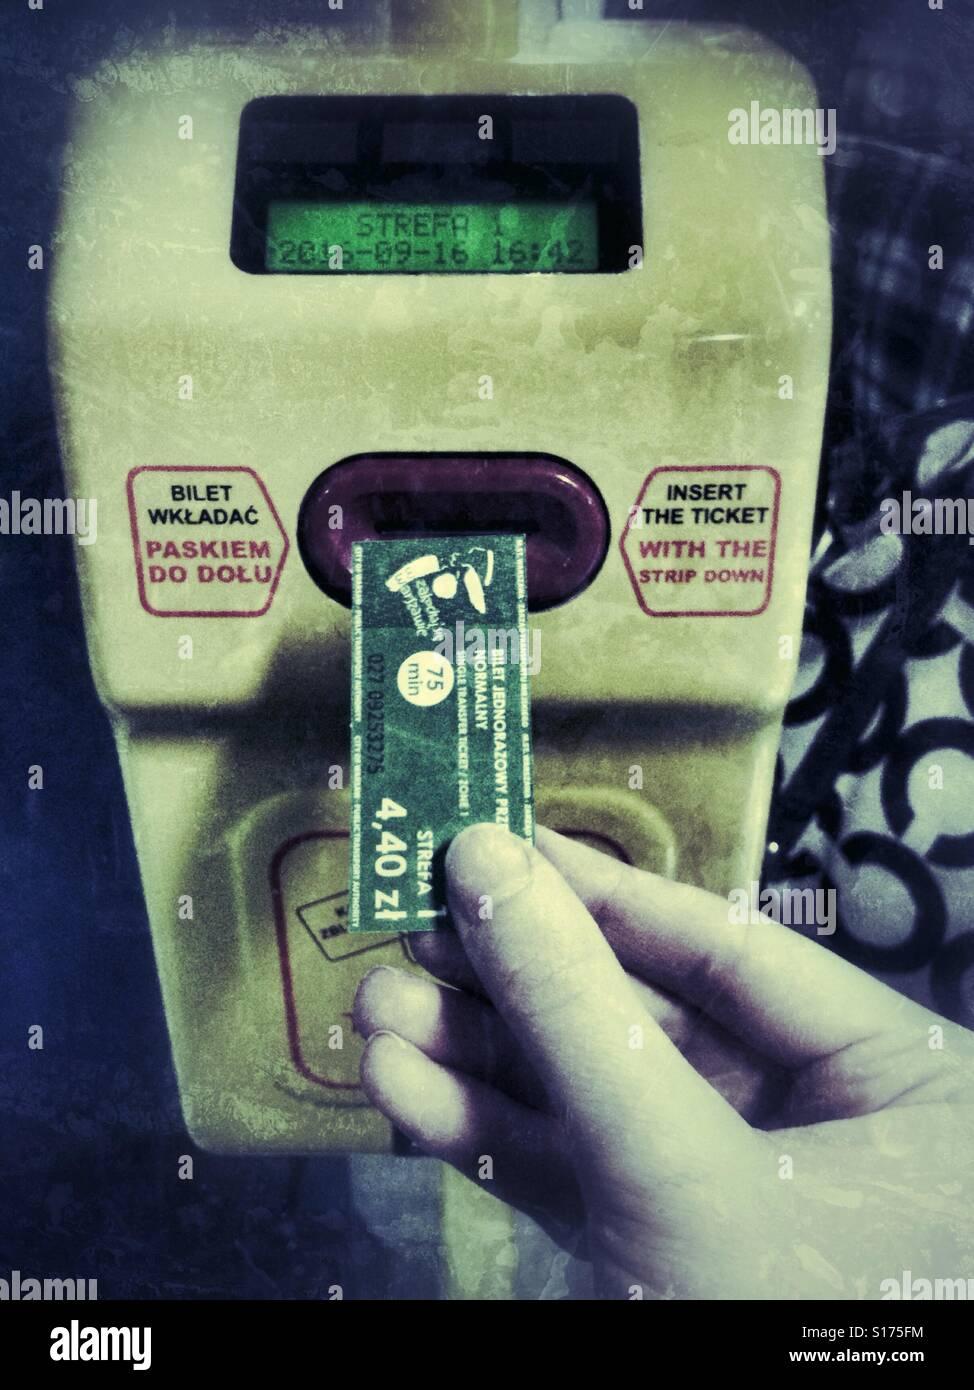 Ticket validation in public transport - Stock Image